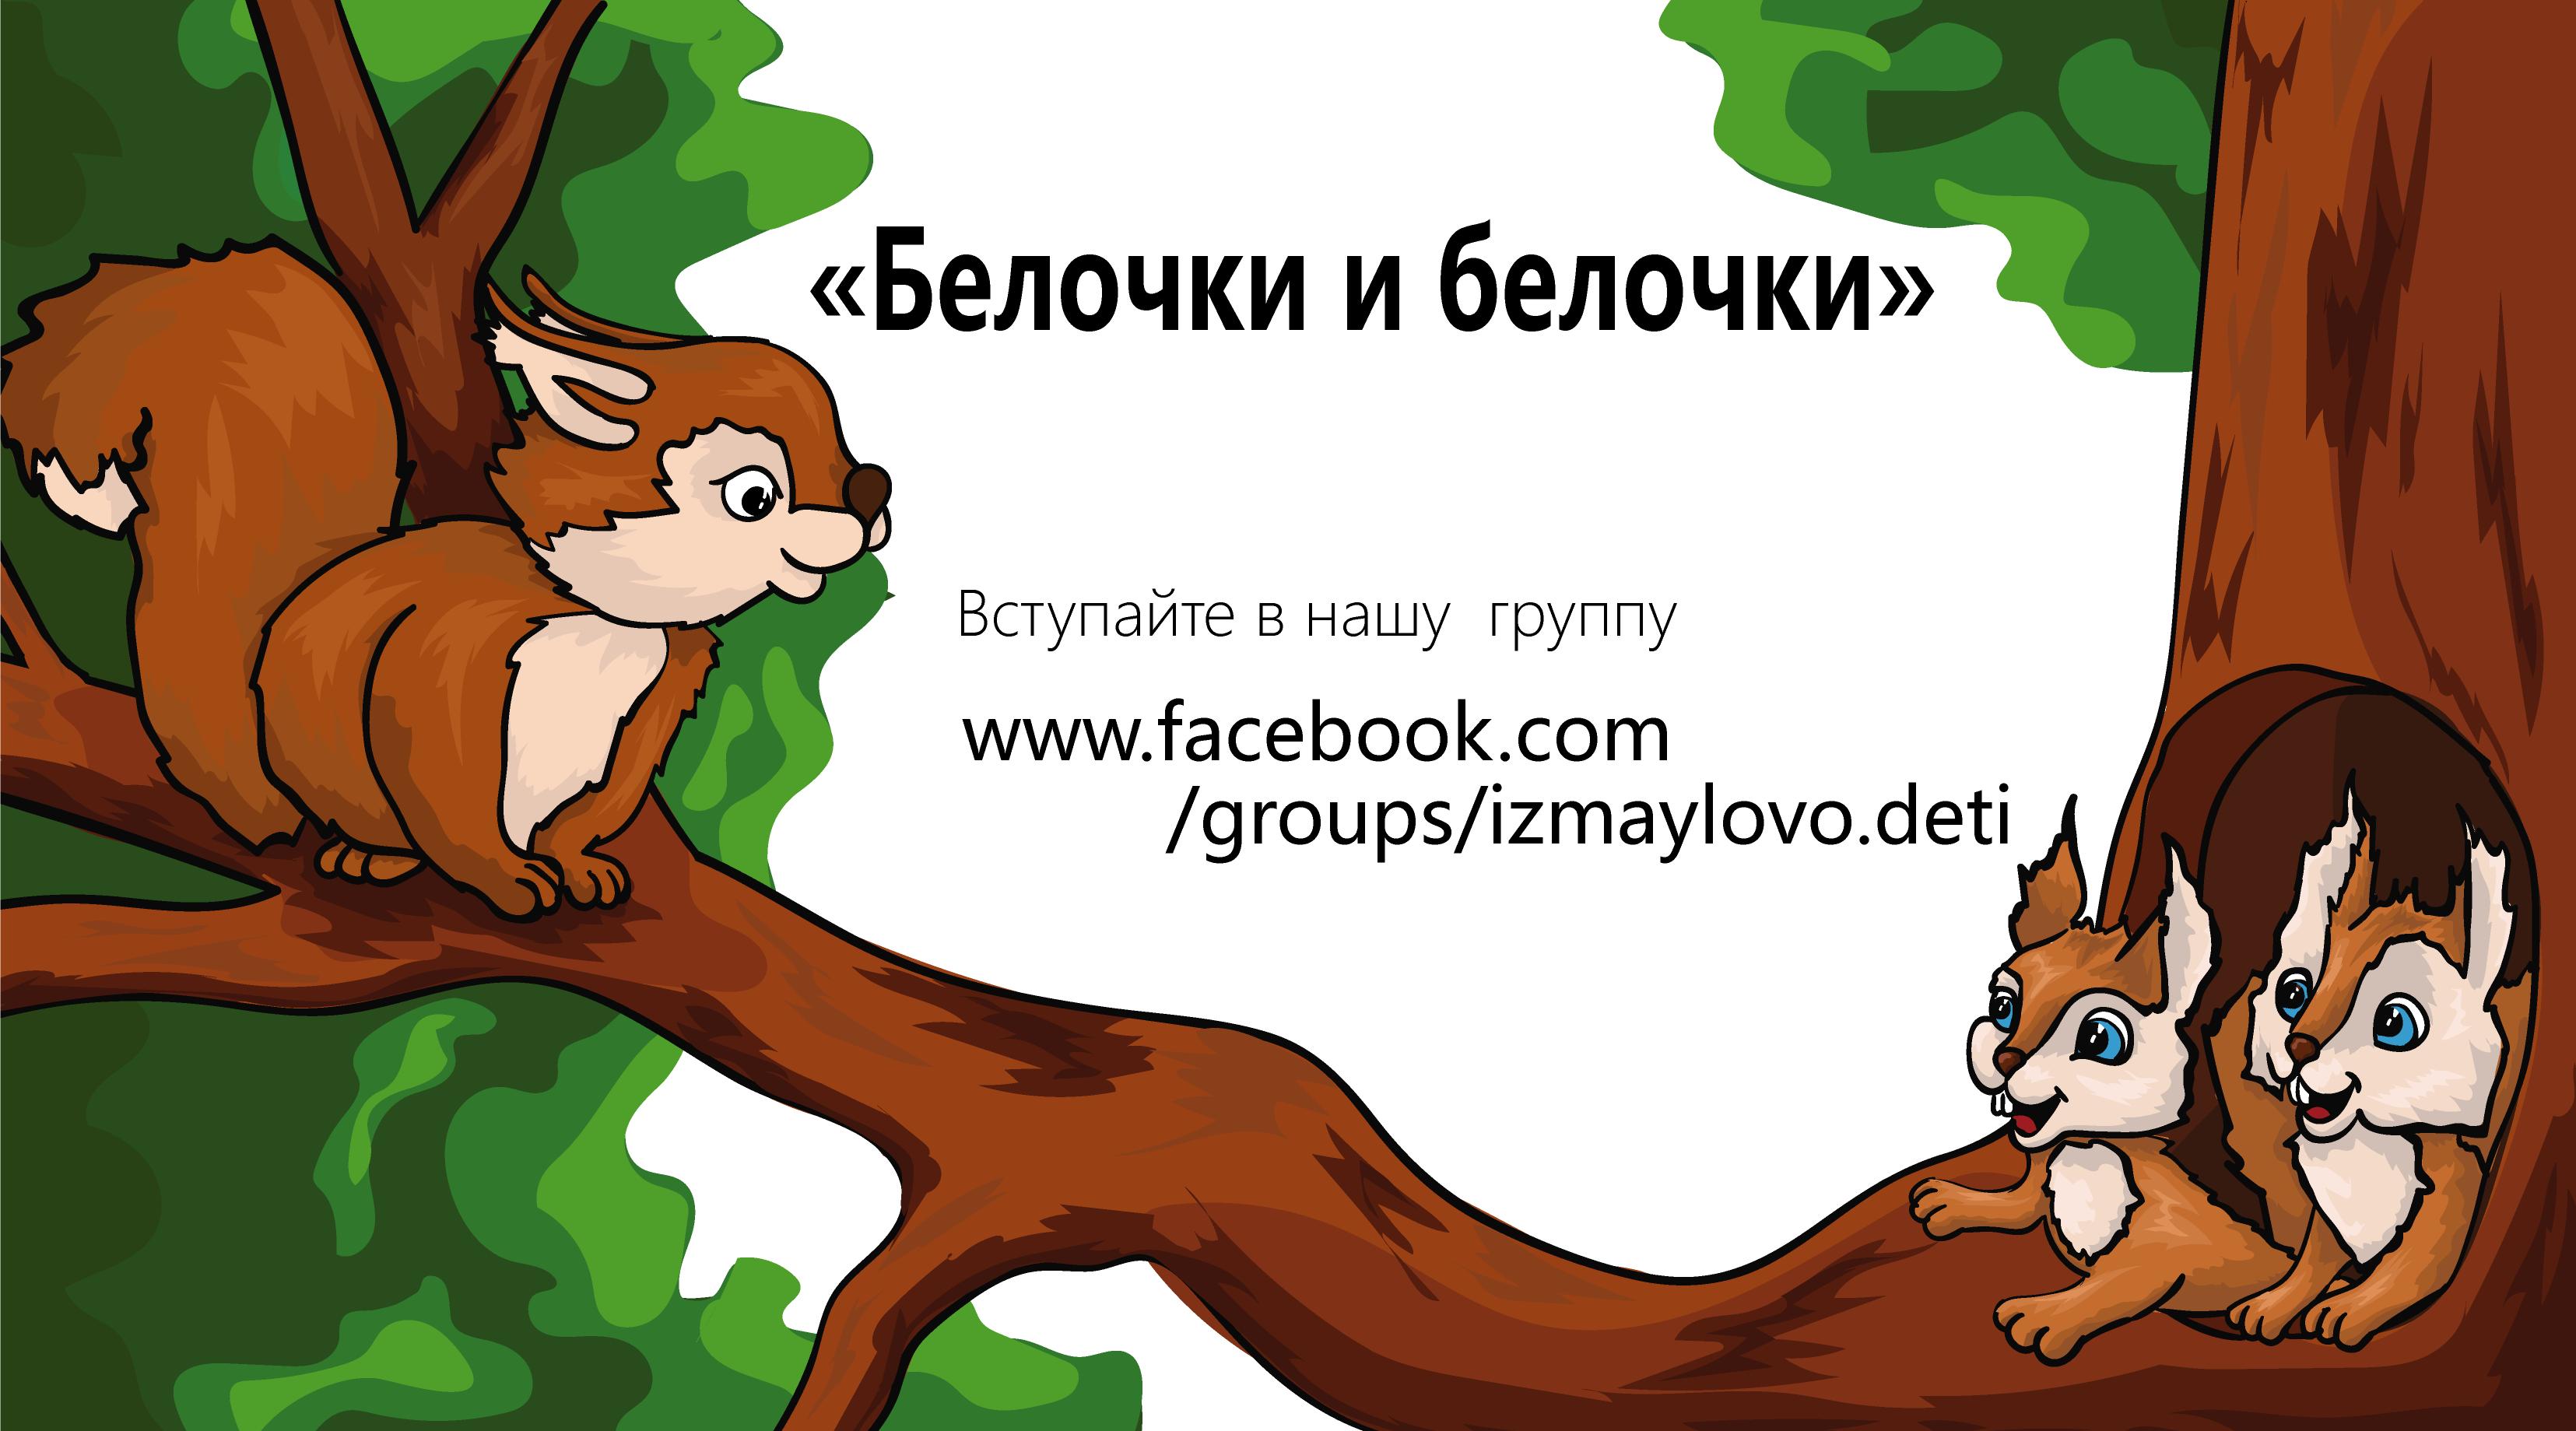 Конкурс на создание макета визиток сообщества мам (белочки). фото f_45859b64fd5ca2c3.png